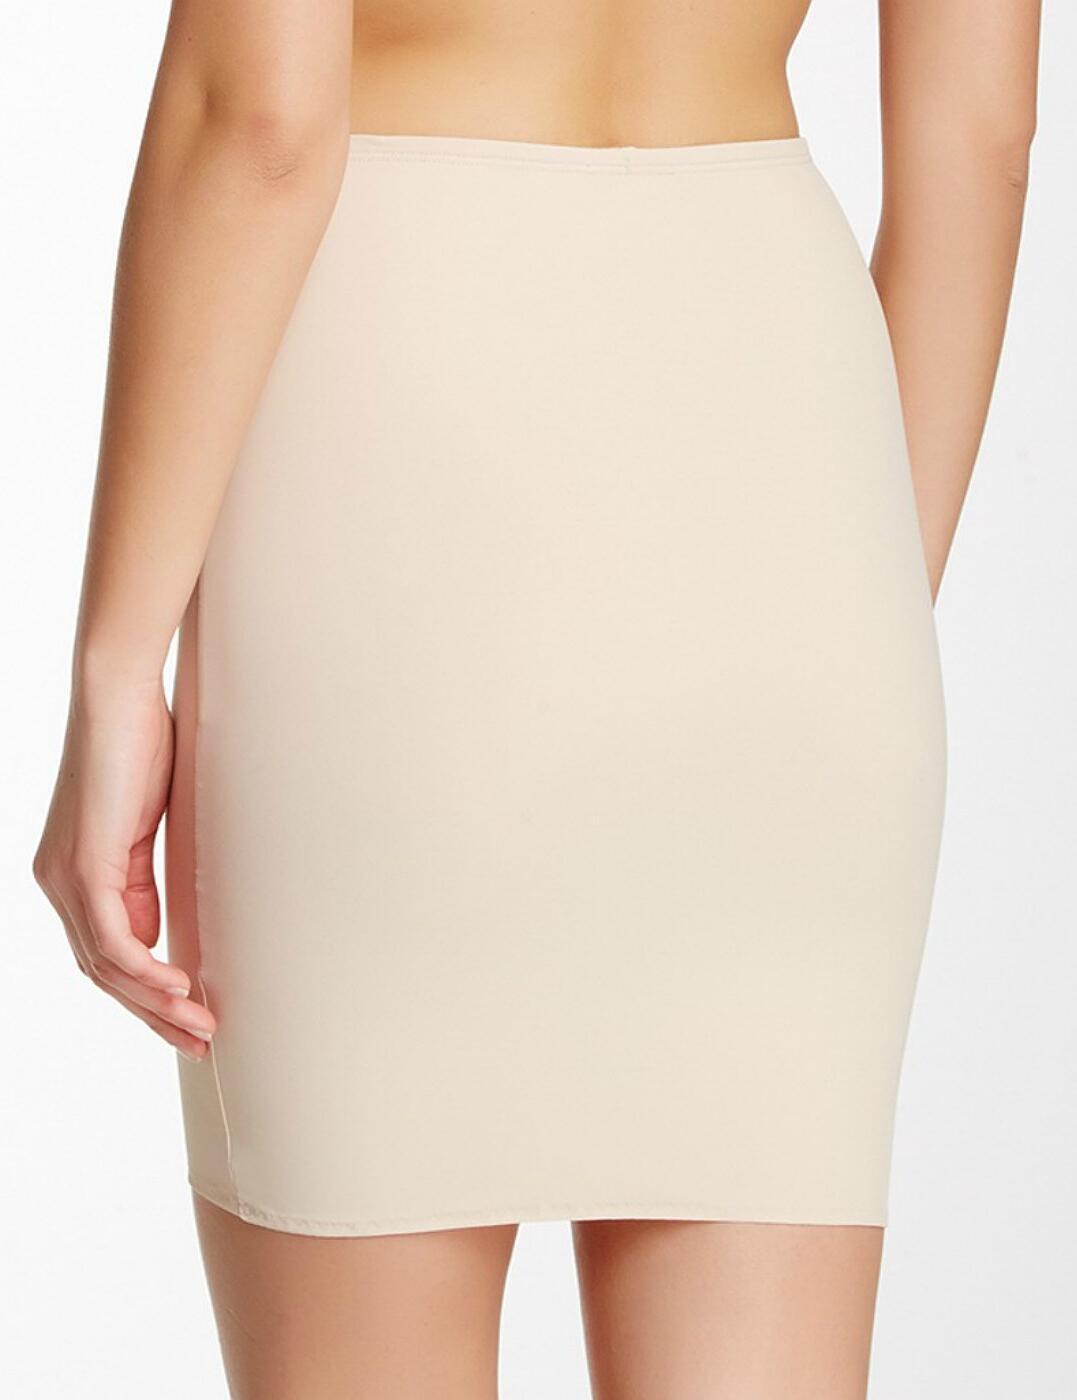 Wacoal-Try-A-Little-Slenderness-Half-Slip-Control-Skirt-802365-Wacoal-Shapewear